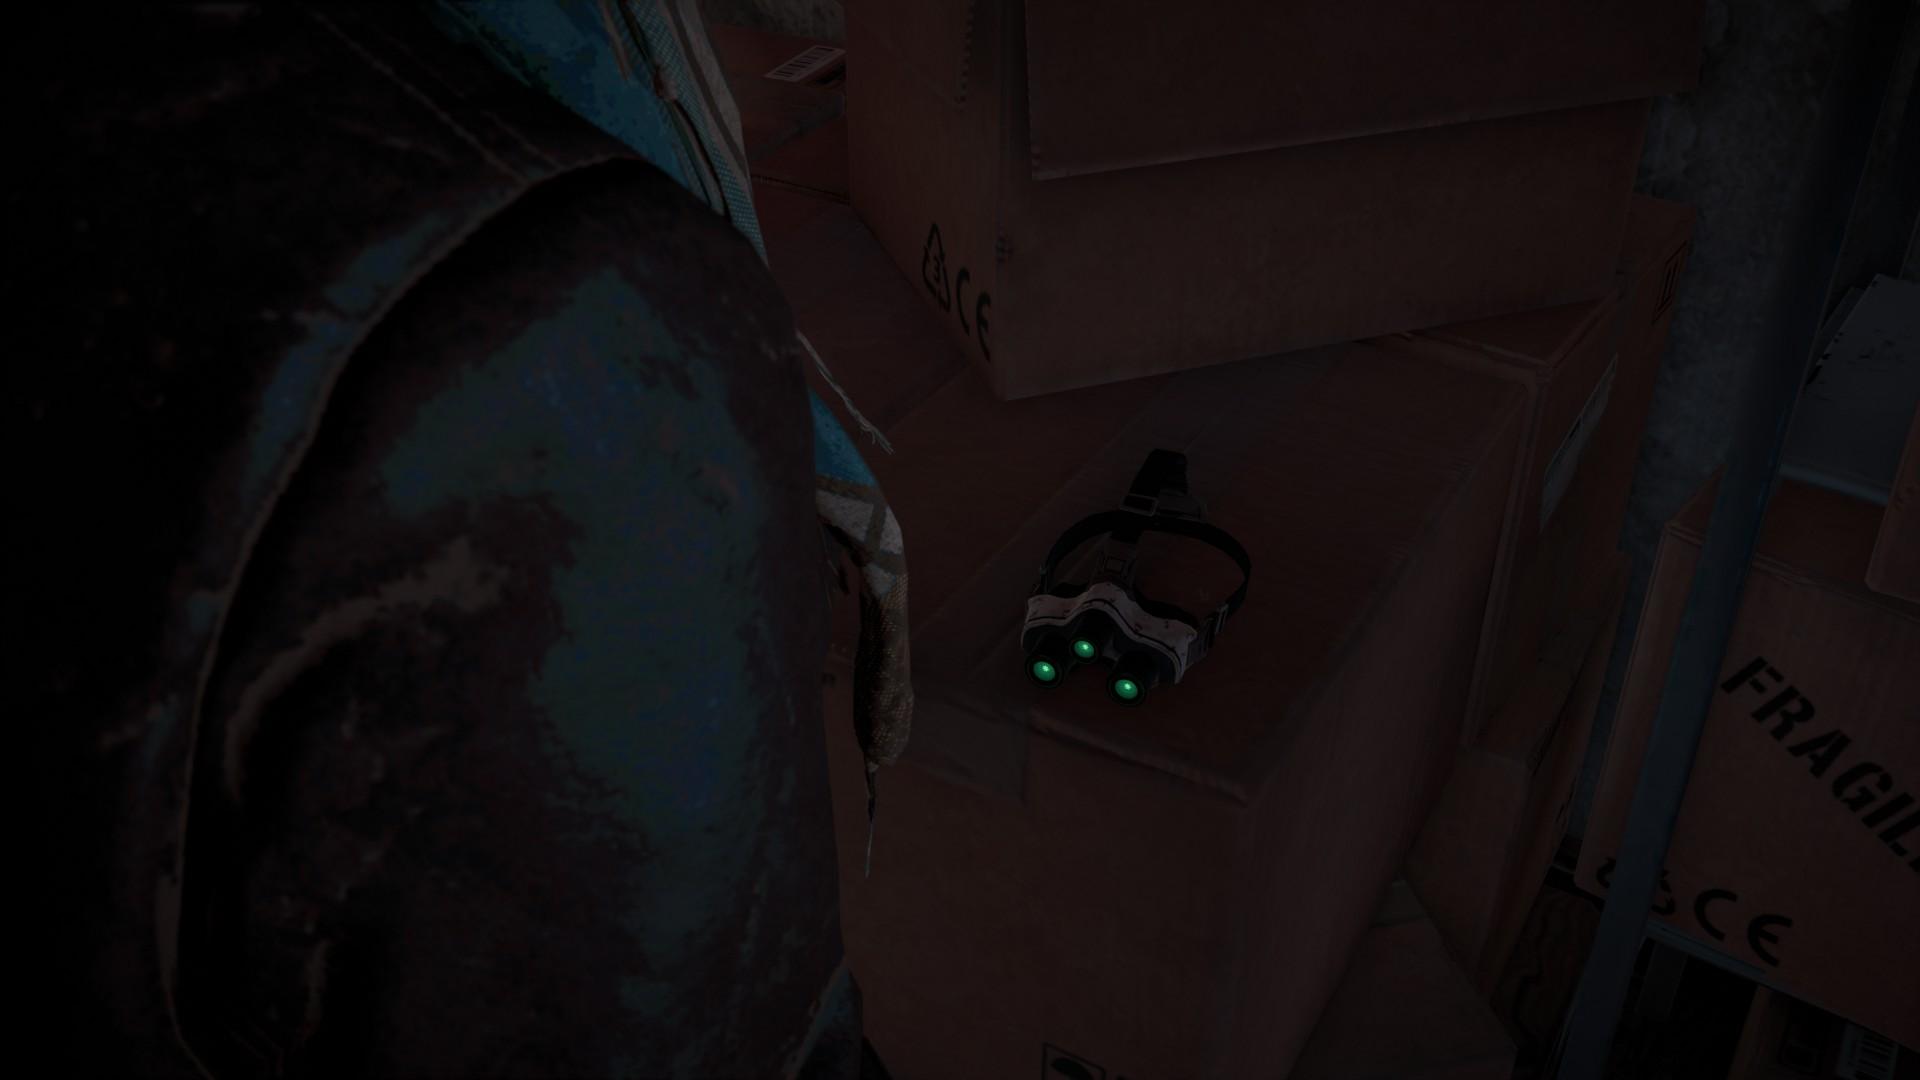 20181022153328_1.jpg - Assassin's Creed: Odyssey